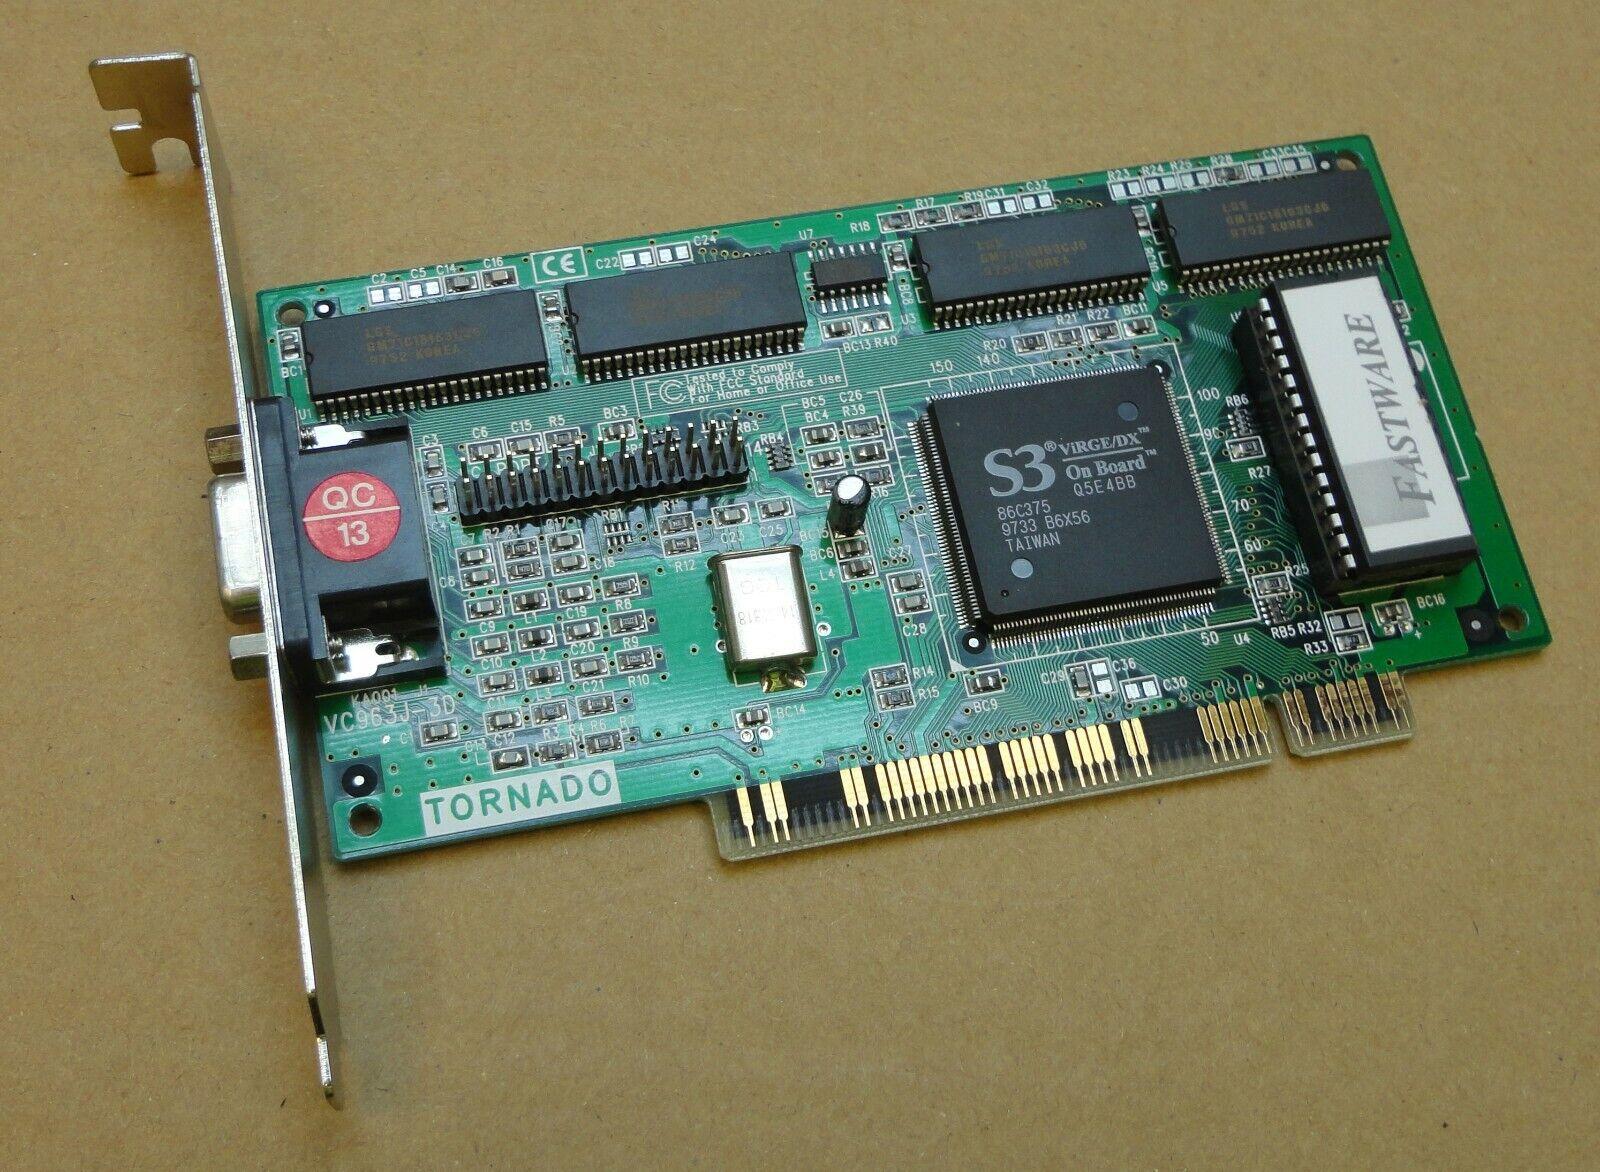 Fastware Tornado VC963J-3D VGA PCI Graphics Card - Chipset: S3 ViRGE/DX Q5E4BB